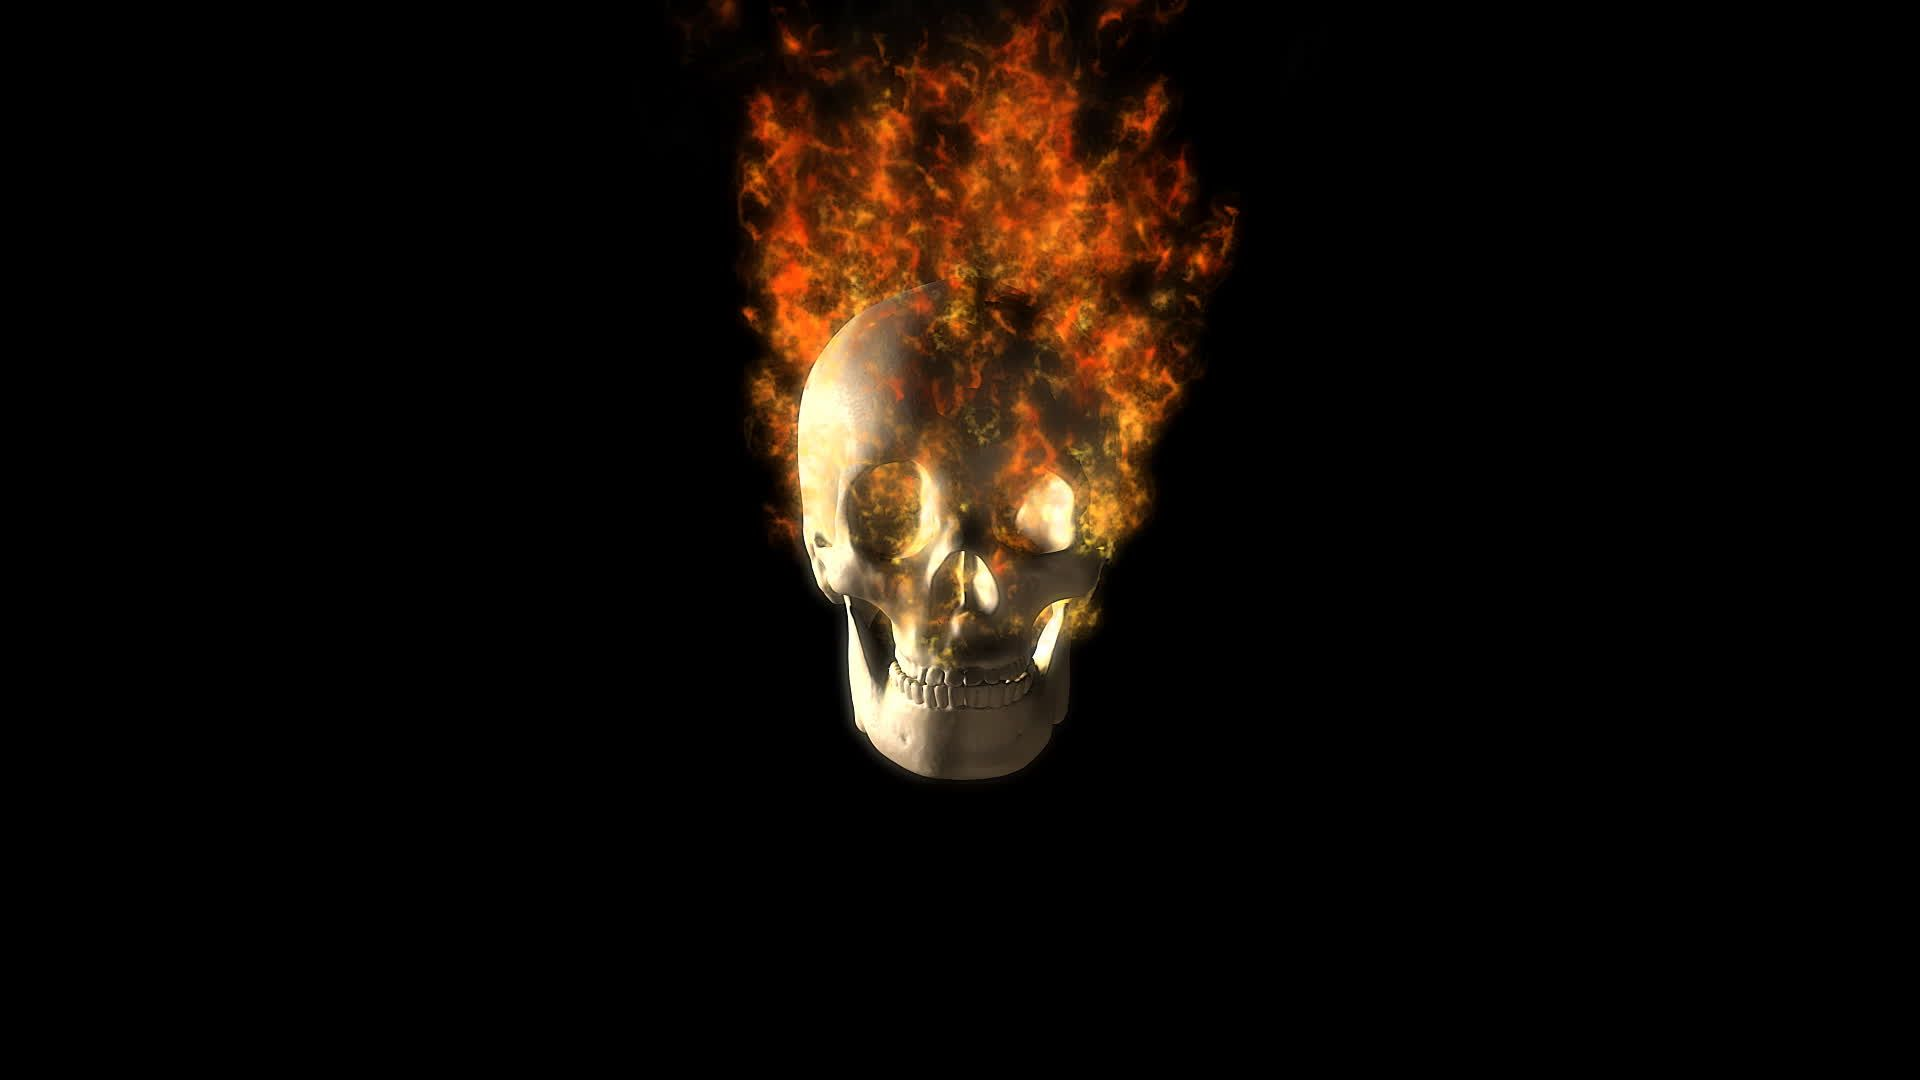 Flaming Skull wallpaper theme